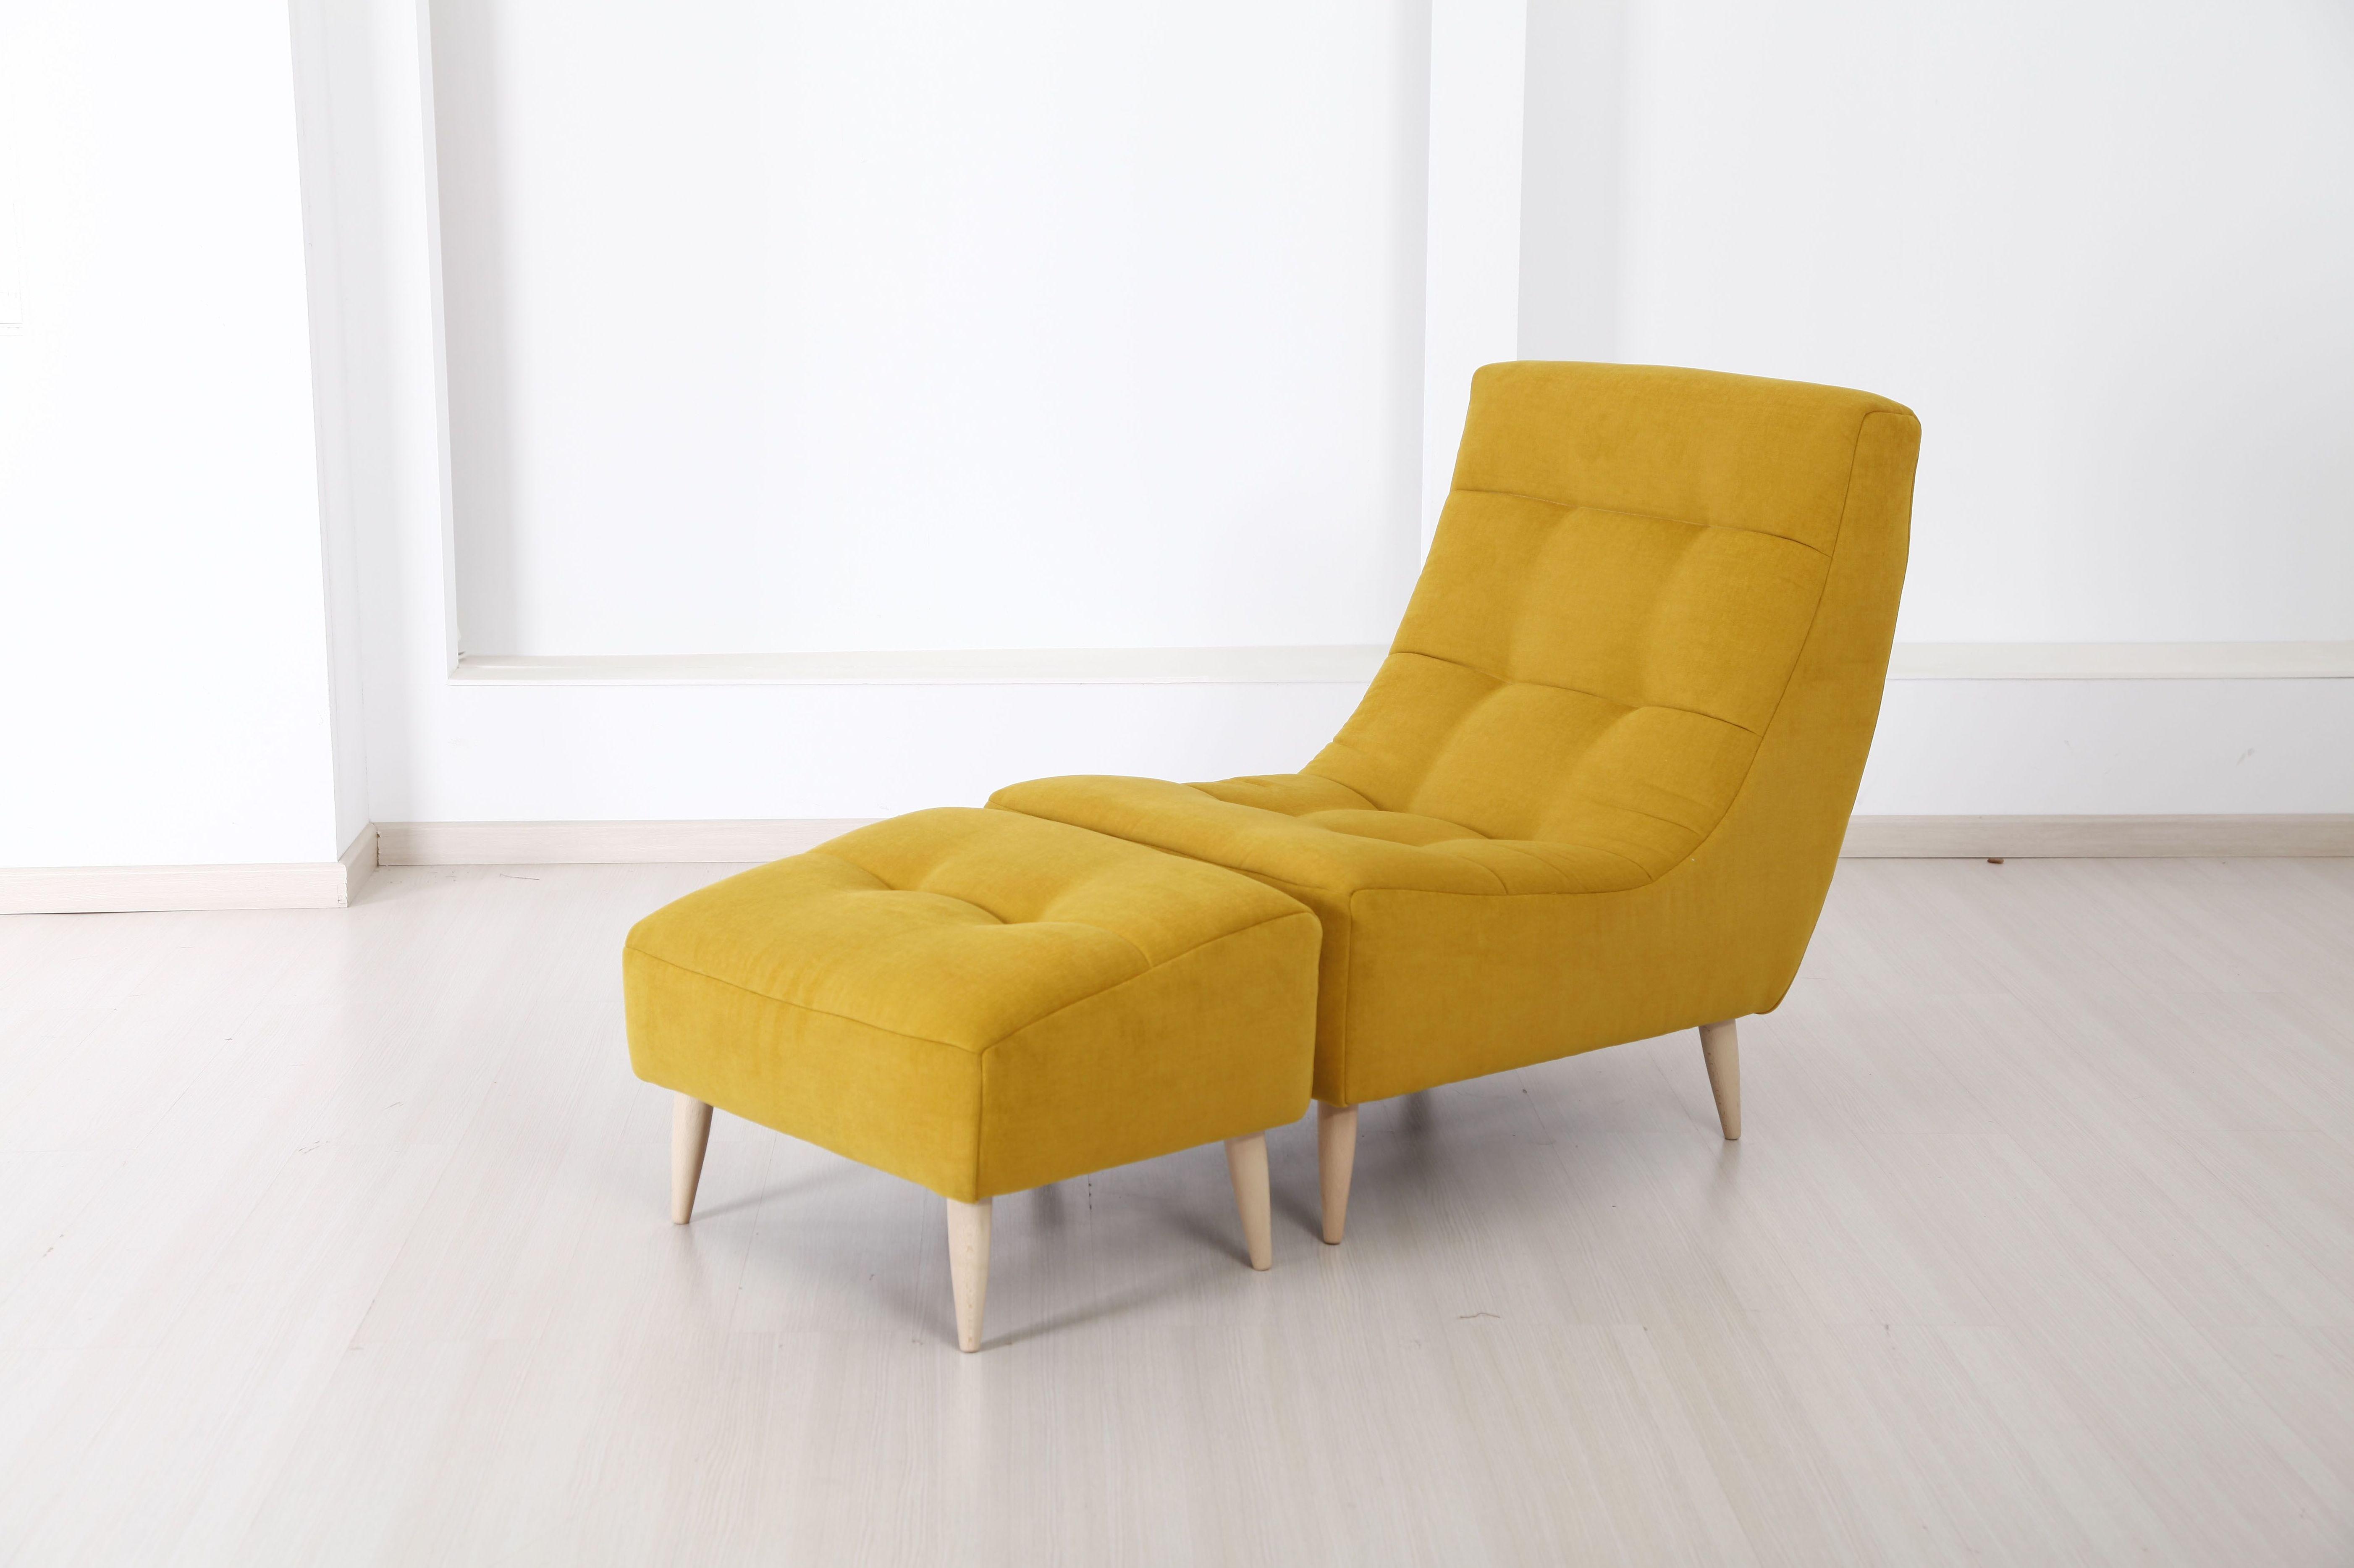 Relax y sillones fama cat logo de muebles y sof s de goga - Muebles fama ...